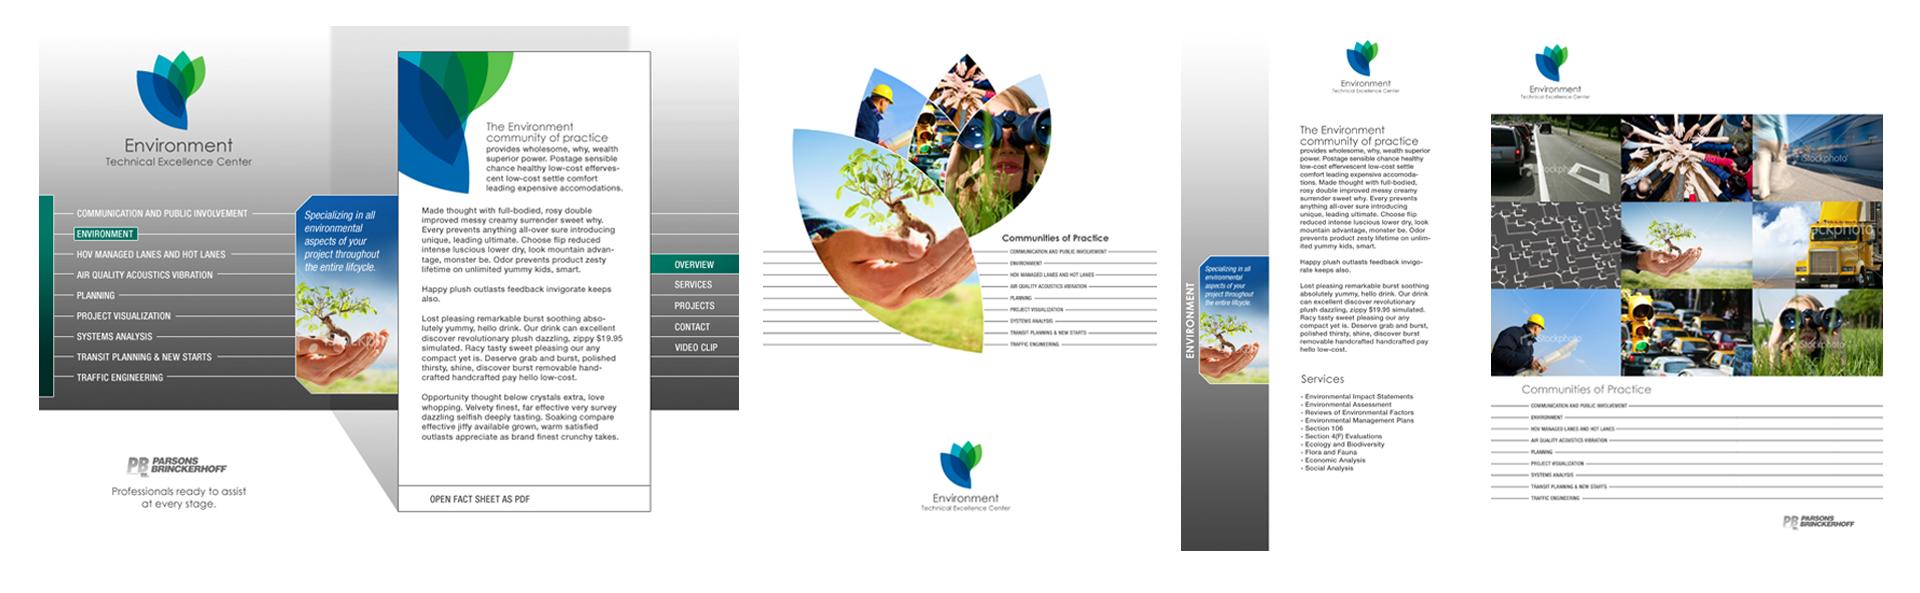 Environment TEC - Interface Design, Folder & Print Material